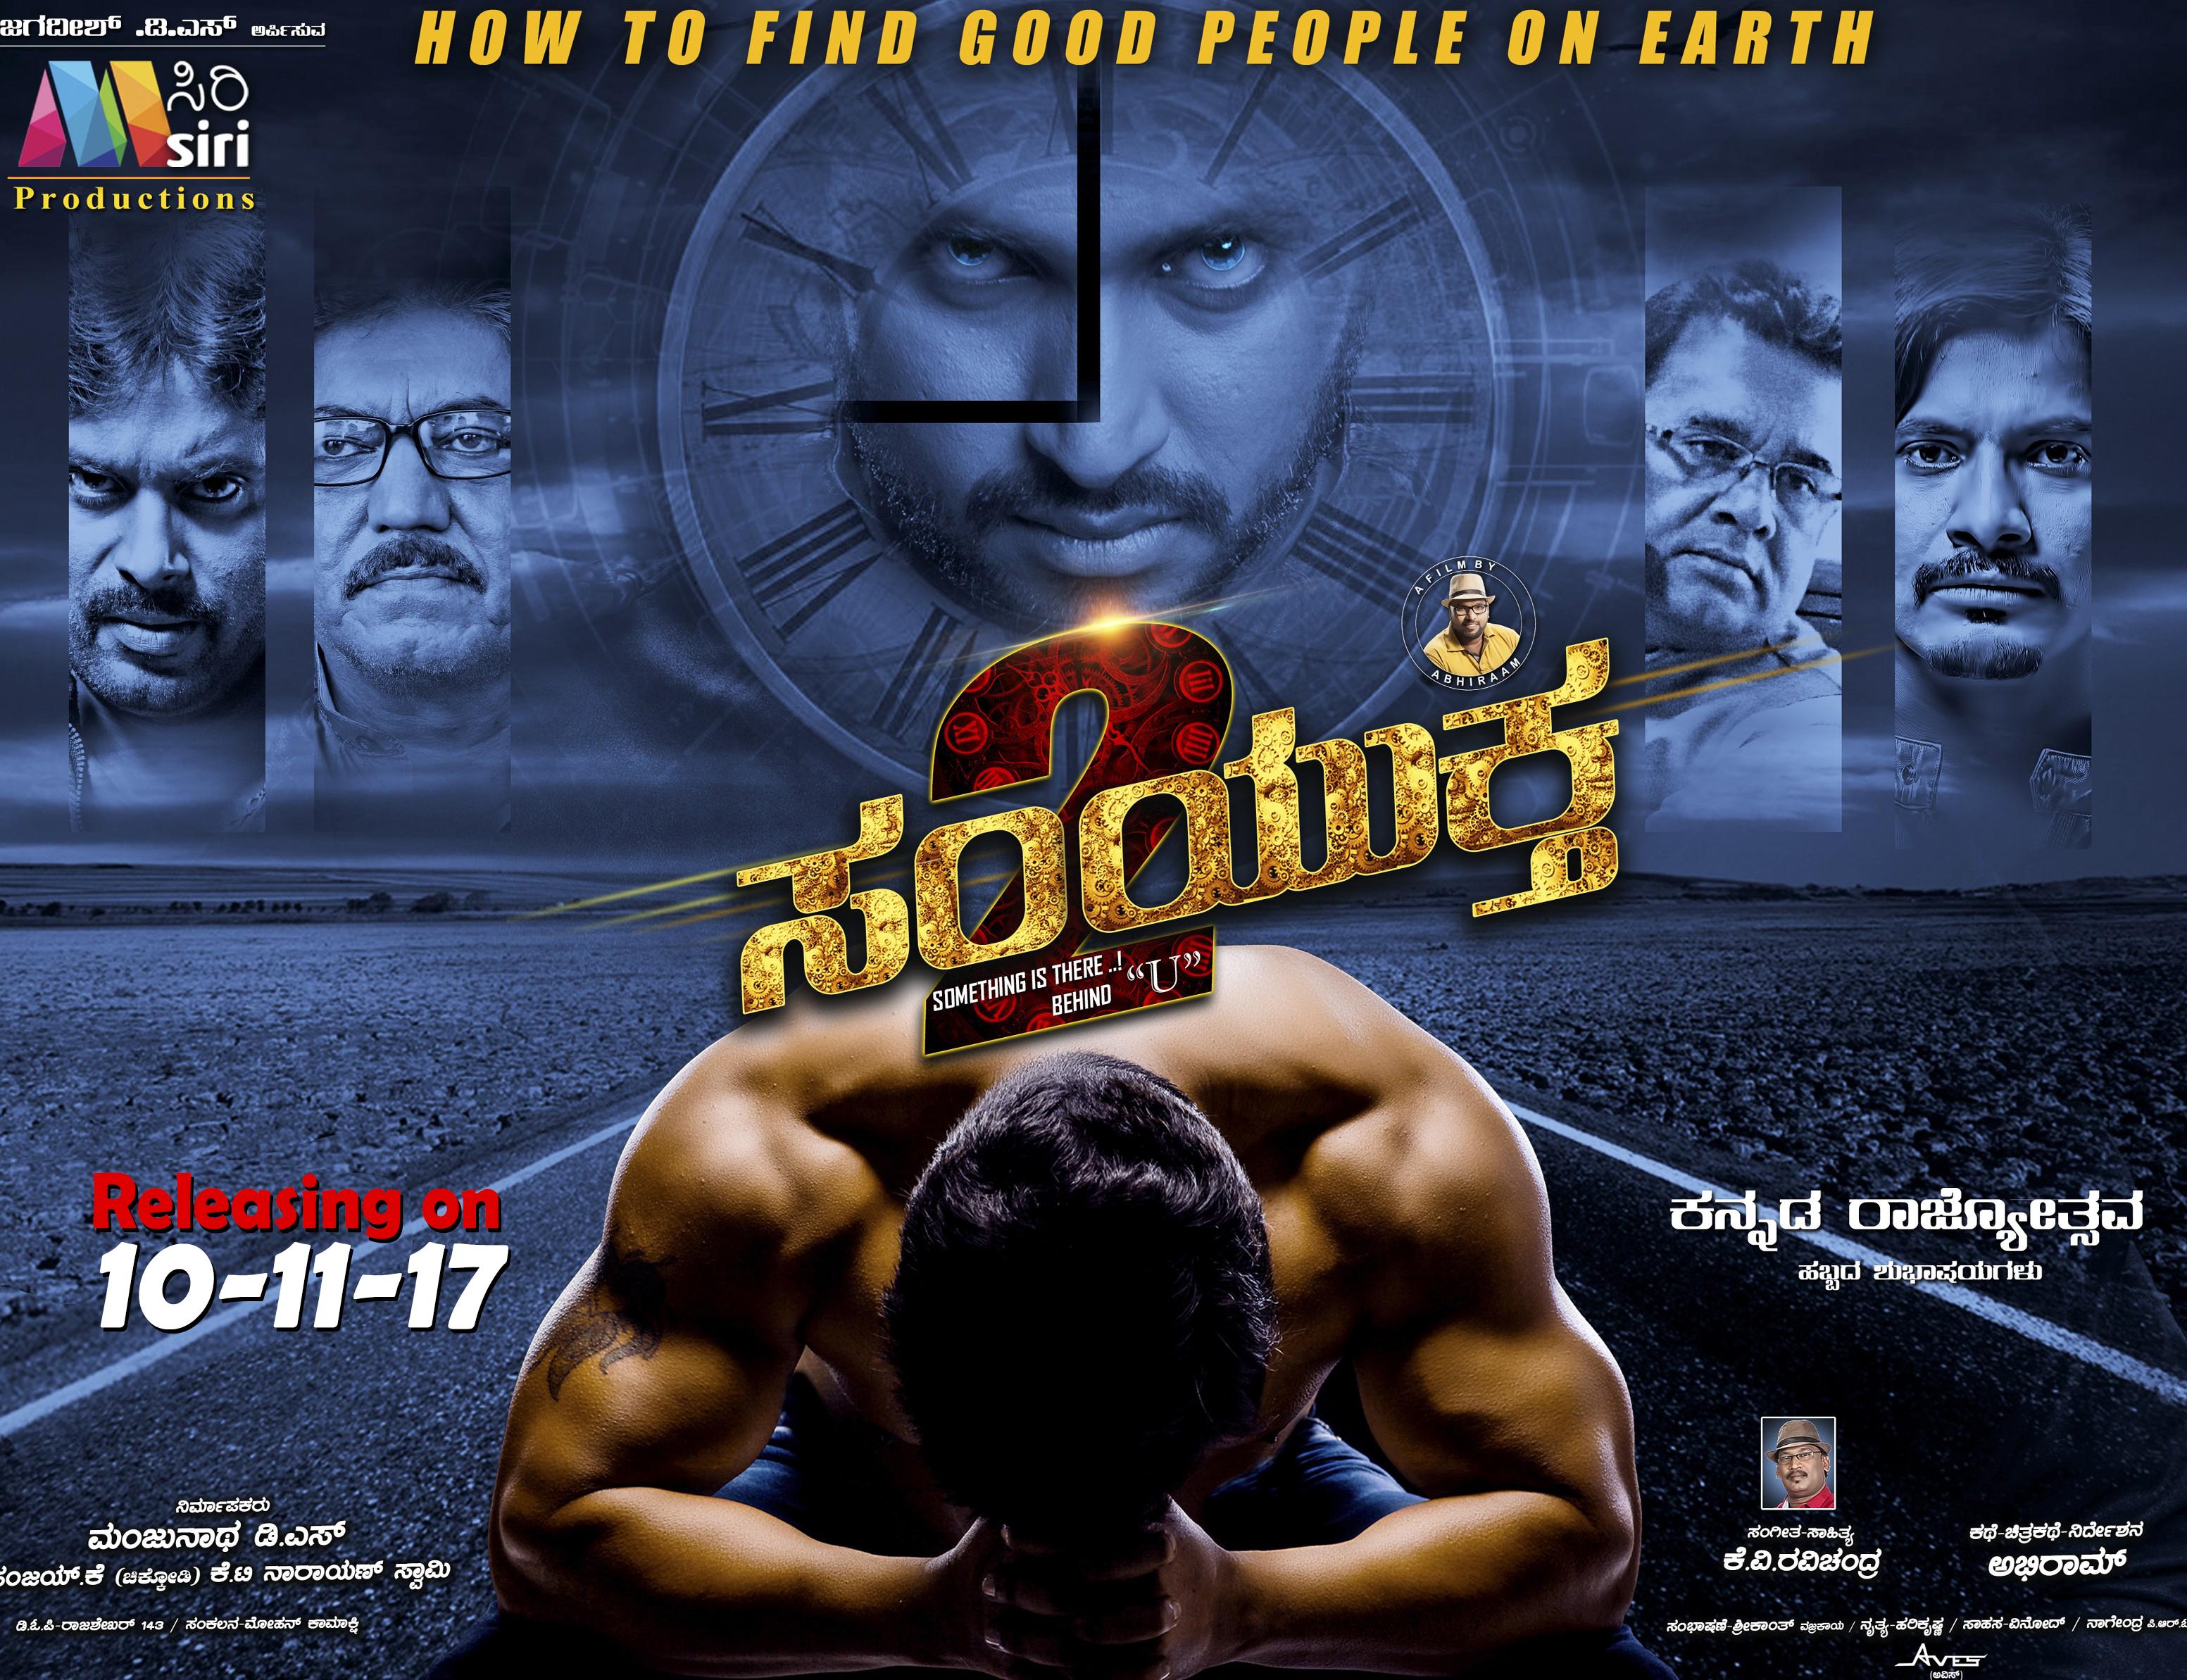 Aatanki Khel (Samyuktha 2) HDTVRip x264 Hindi Dubbed [730MB] Download